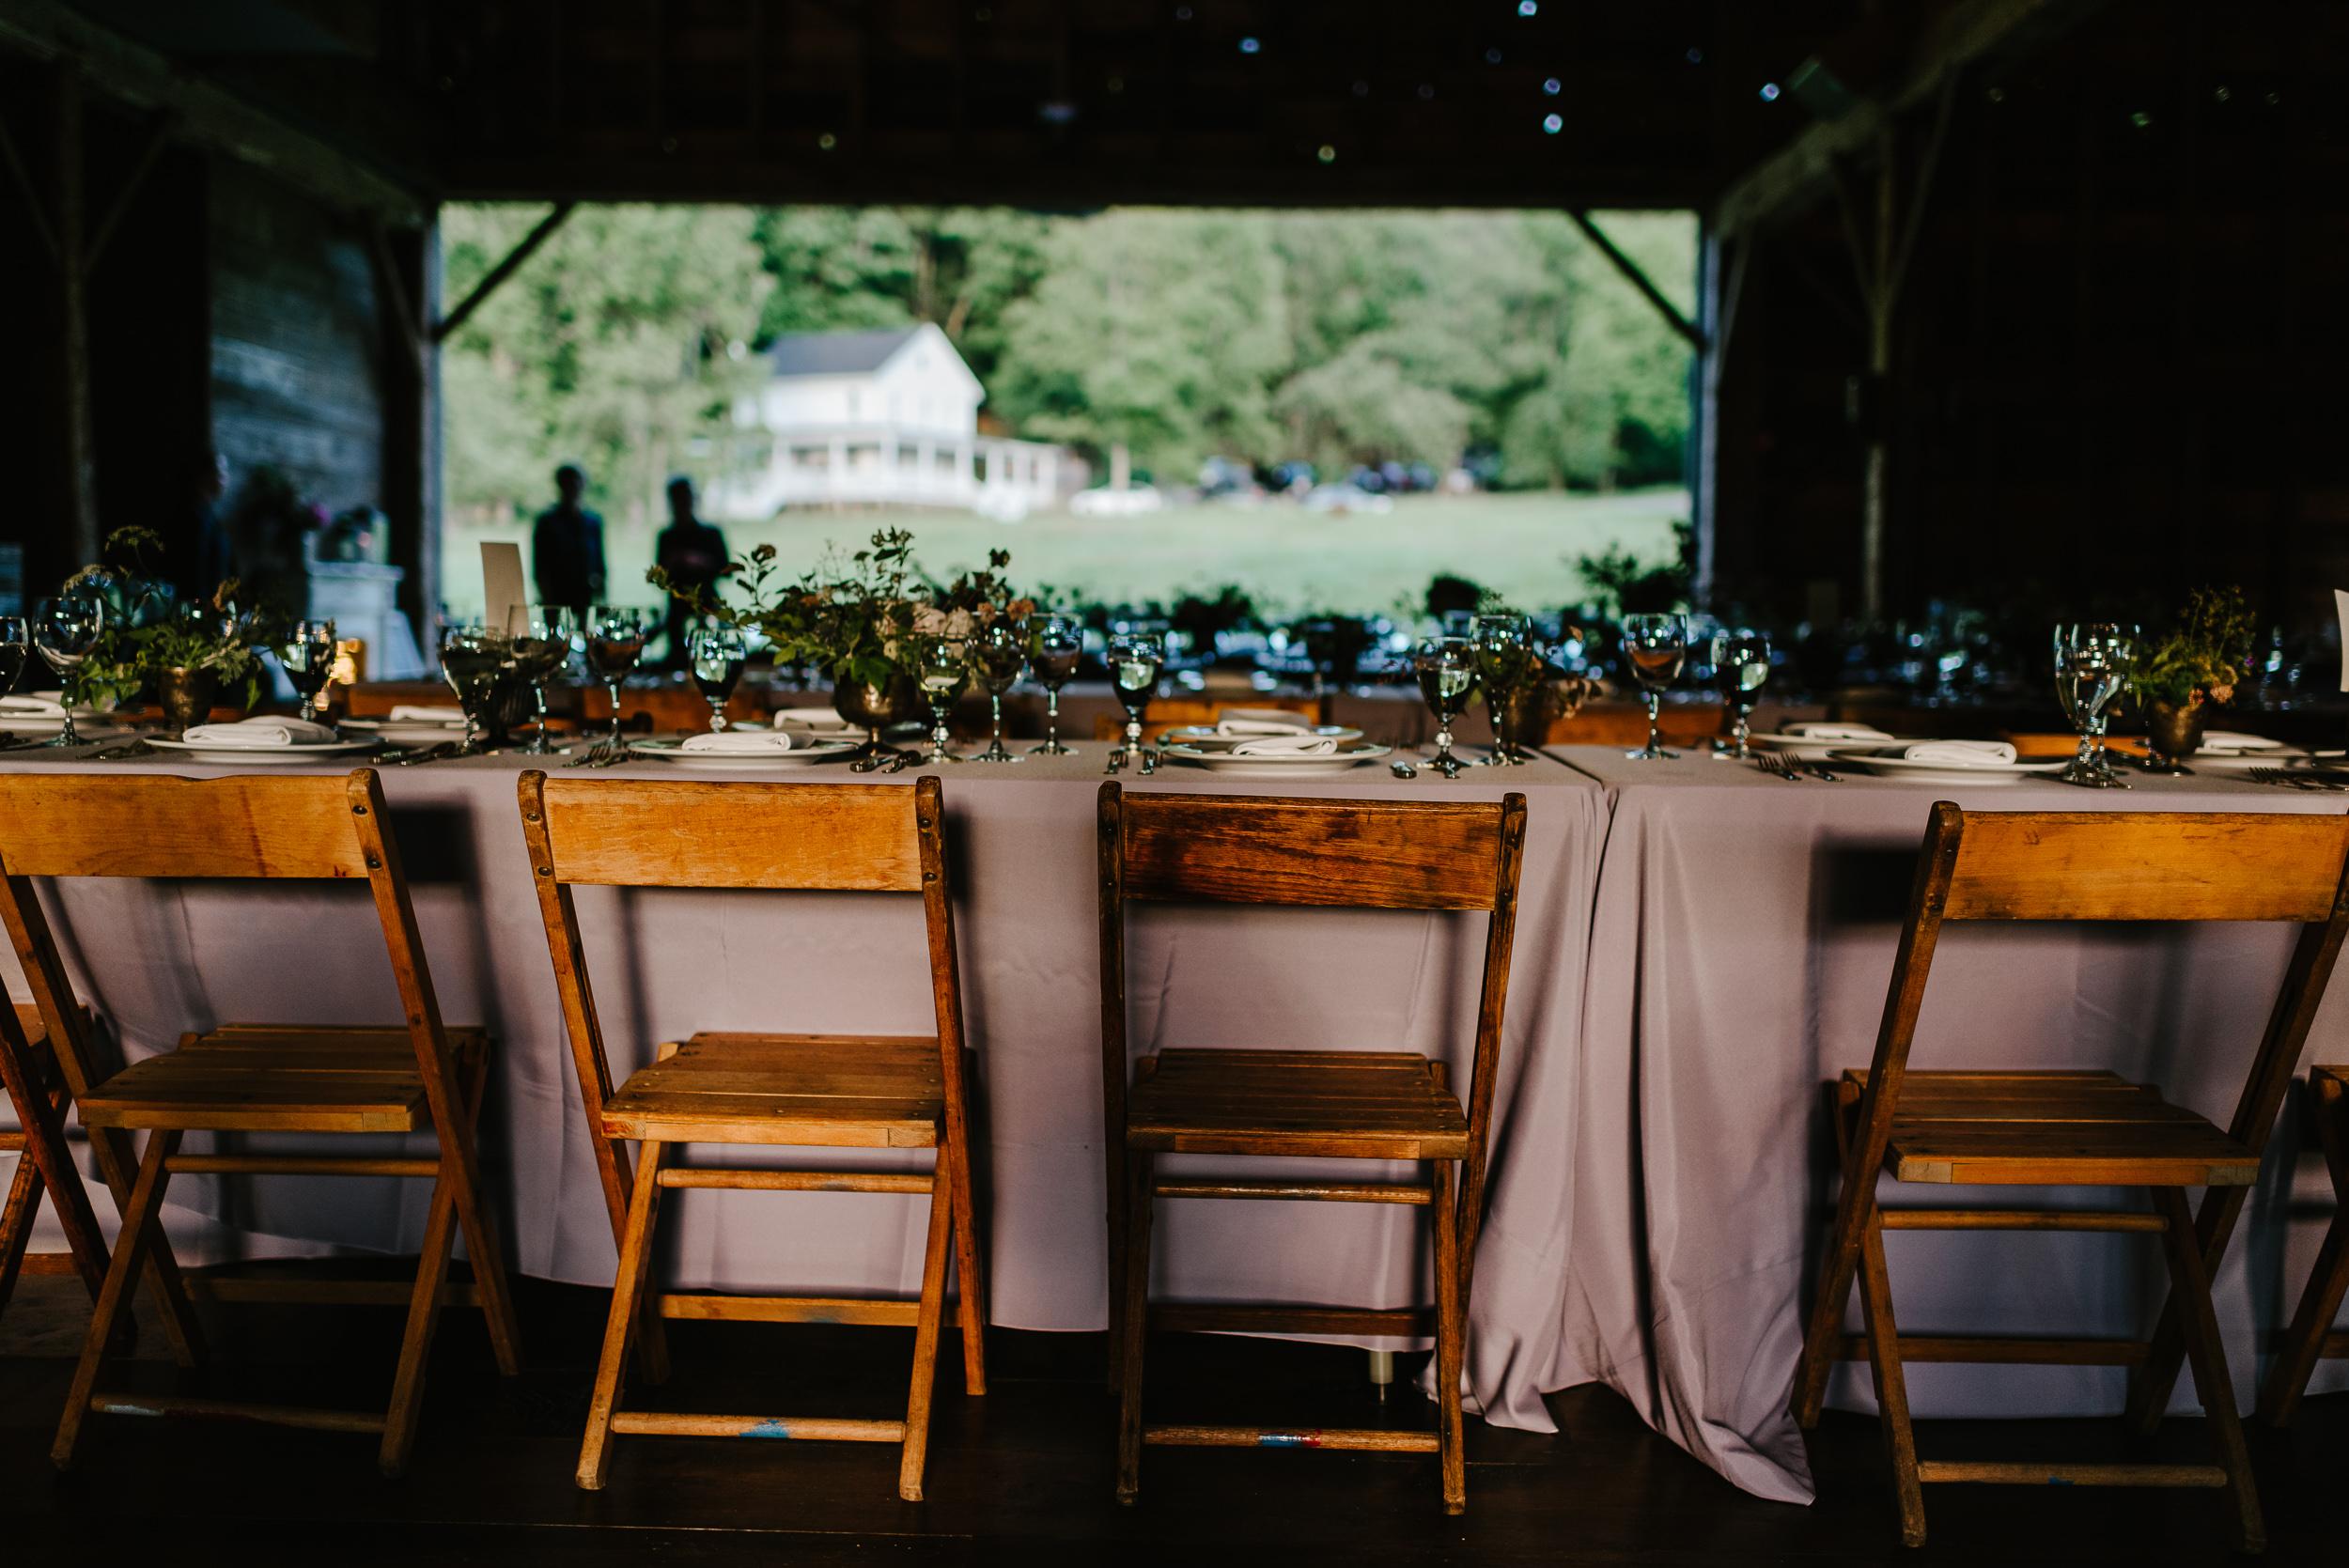 075-Handsome Hollow Wedding Photos Handsome Hollow Wedding Air BNB Wedding Brooklyn Wedding Photographer.jpg